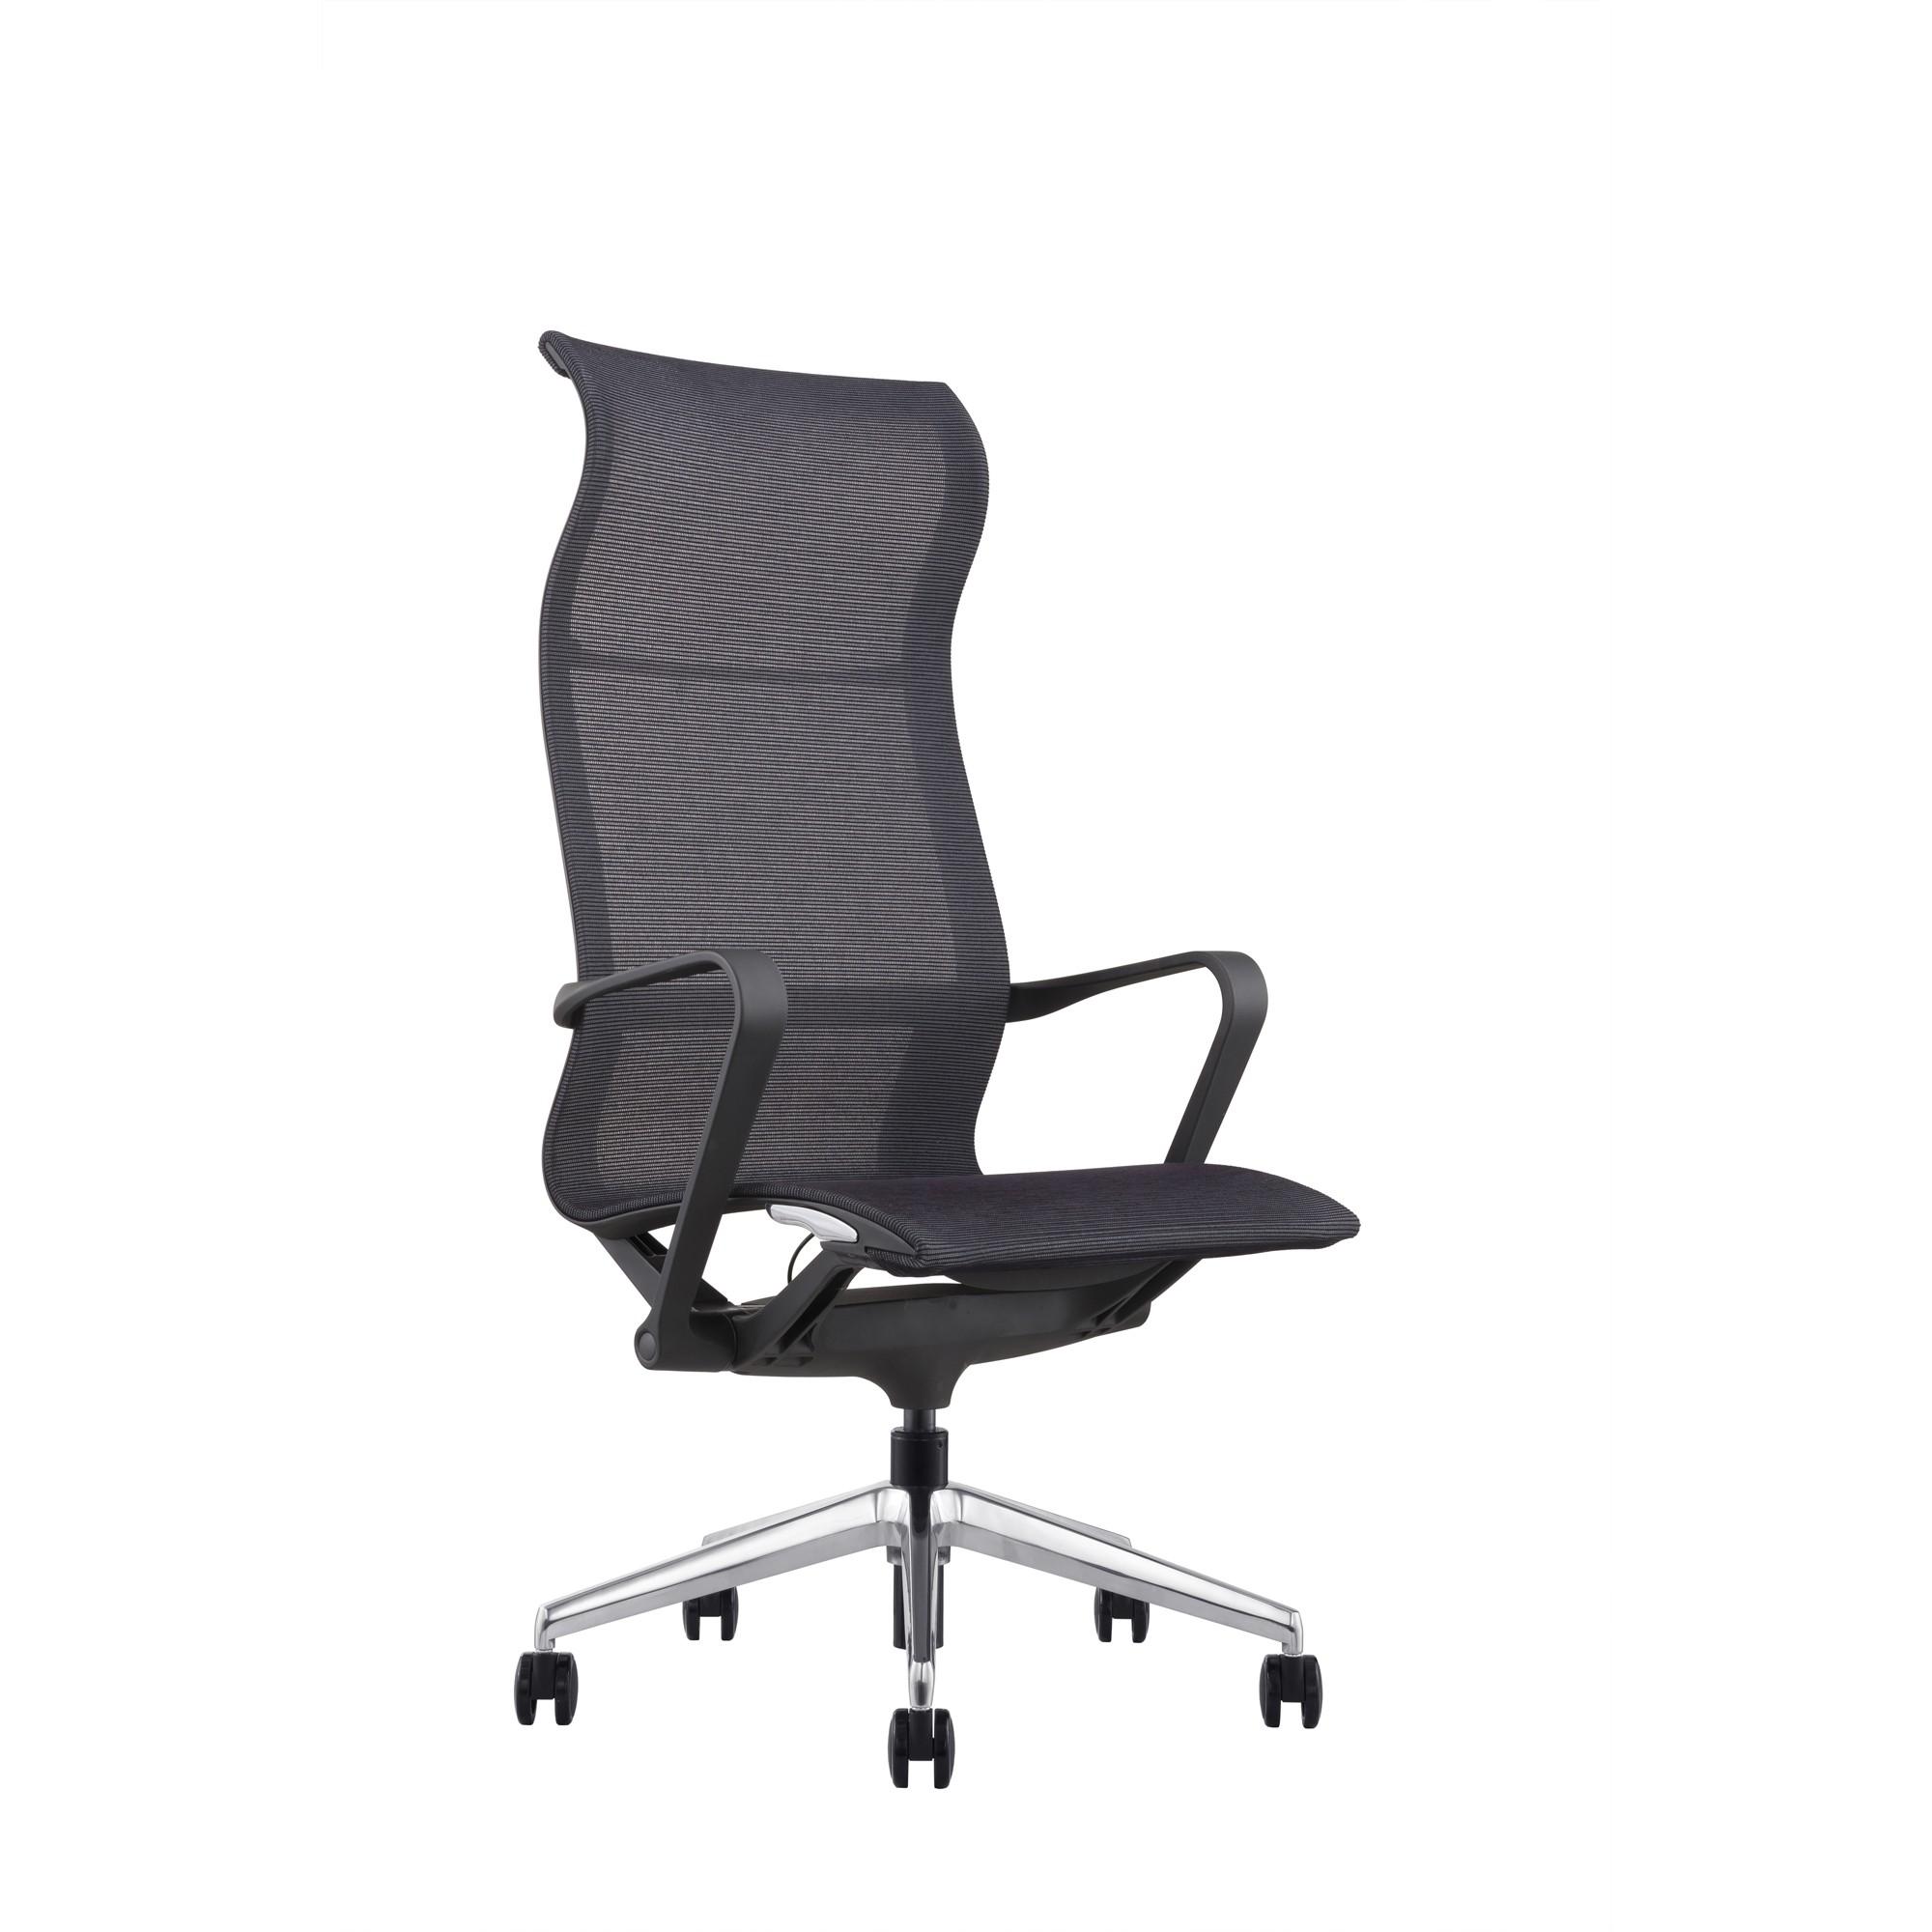 Hilo Series Ergonomic Office Chair High Back Mesh Chair – Hydraulic  Adjustable Height and Seat, Tilt Lock, Extensive Lumbar Support Mesh Desk  ...